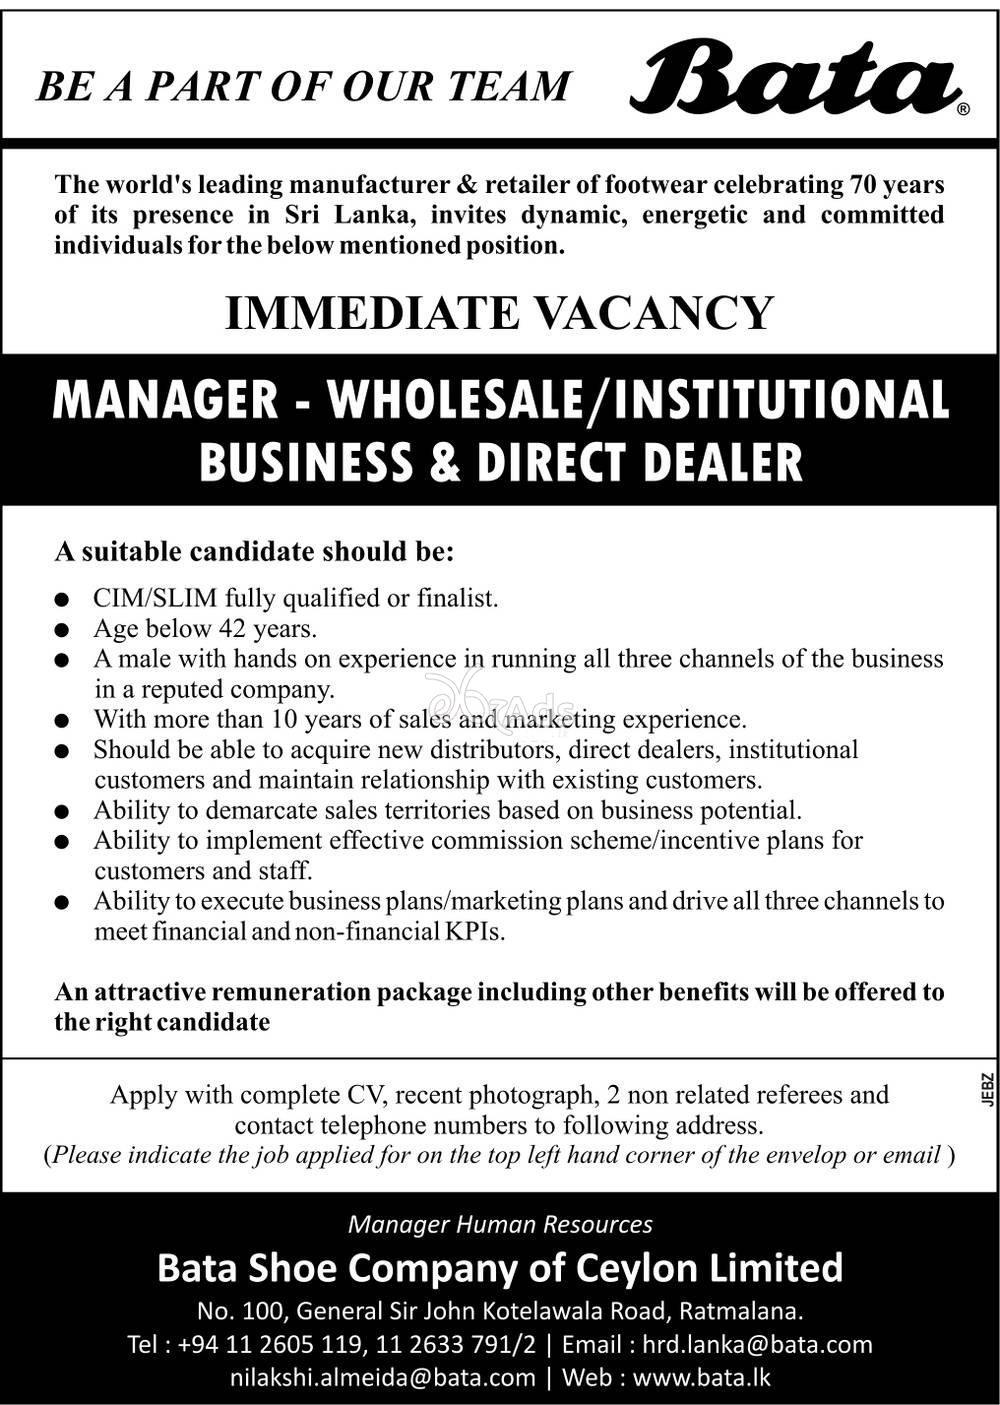 Manager - Bata Shoe Company of Ceylon